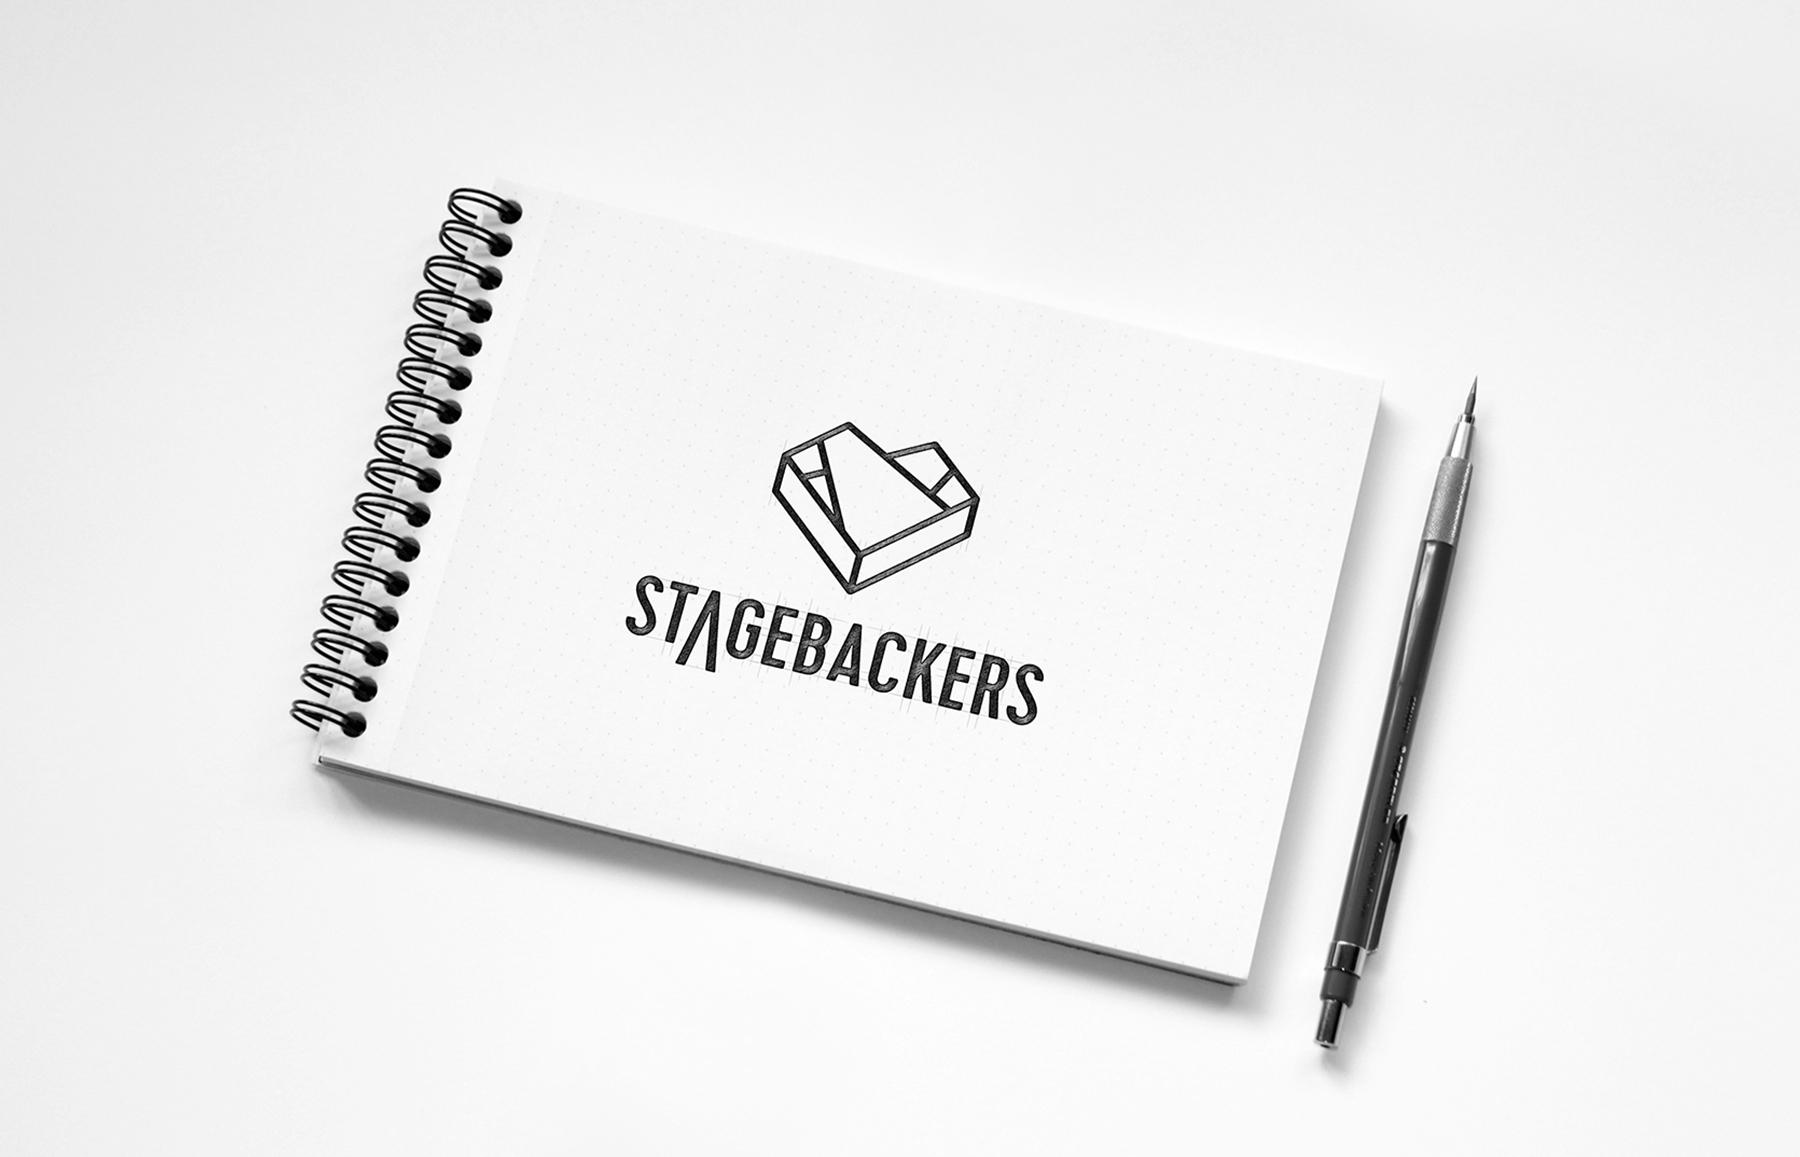 Stagebackers Main Mark Sketch